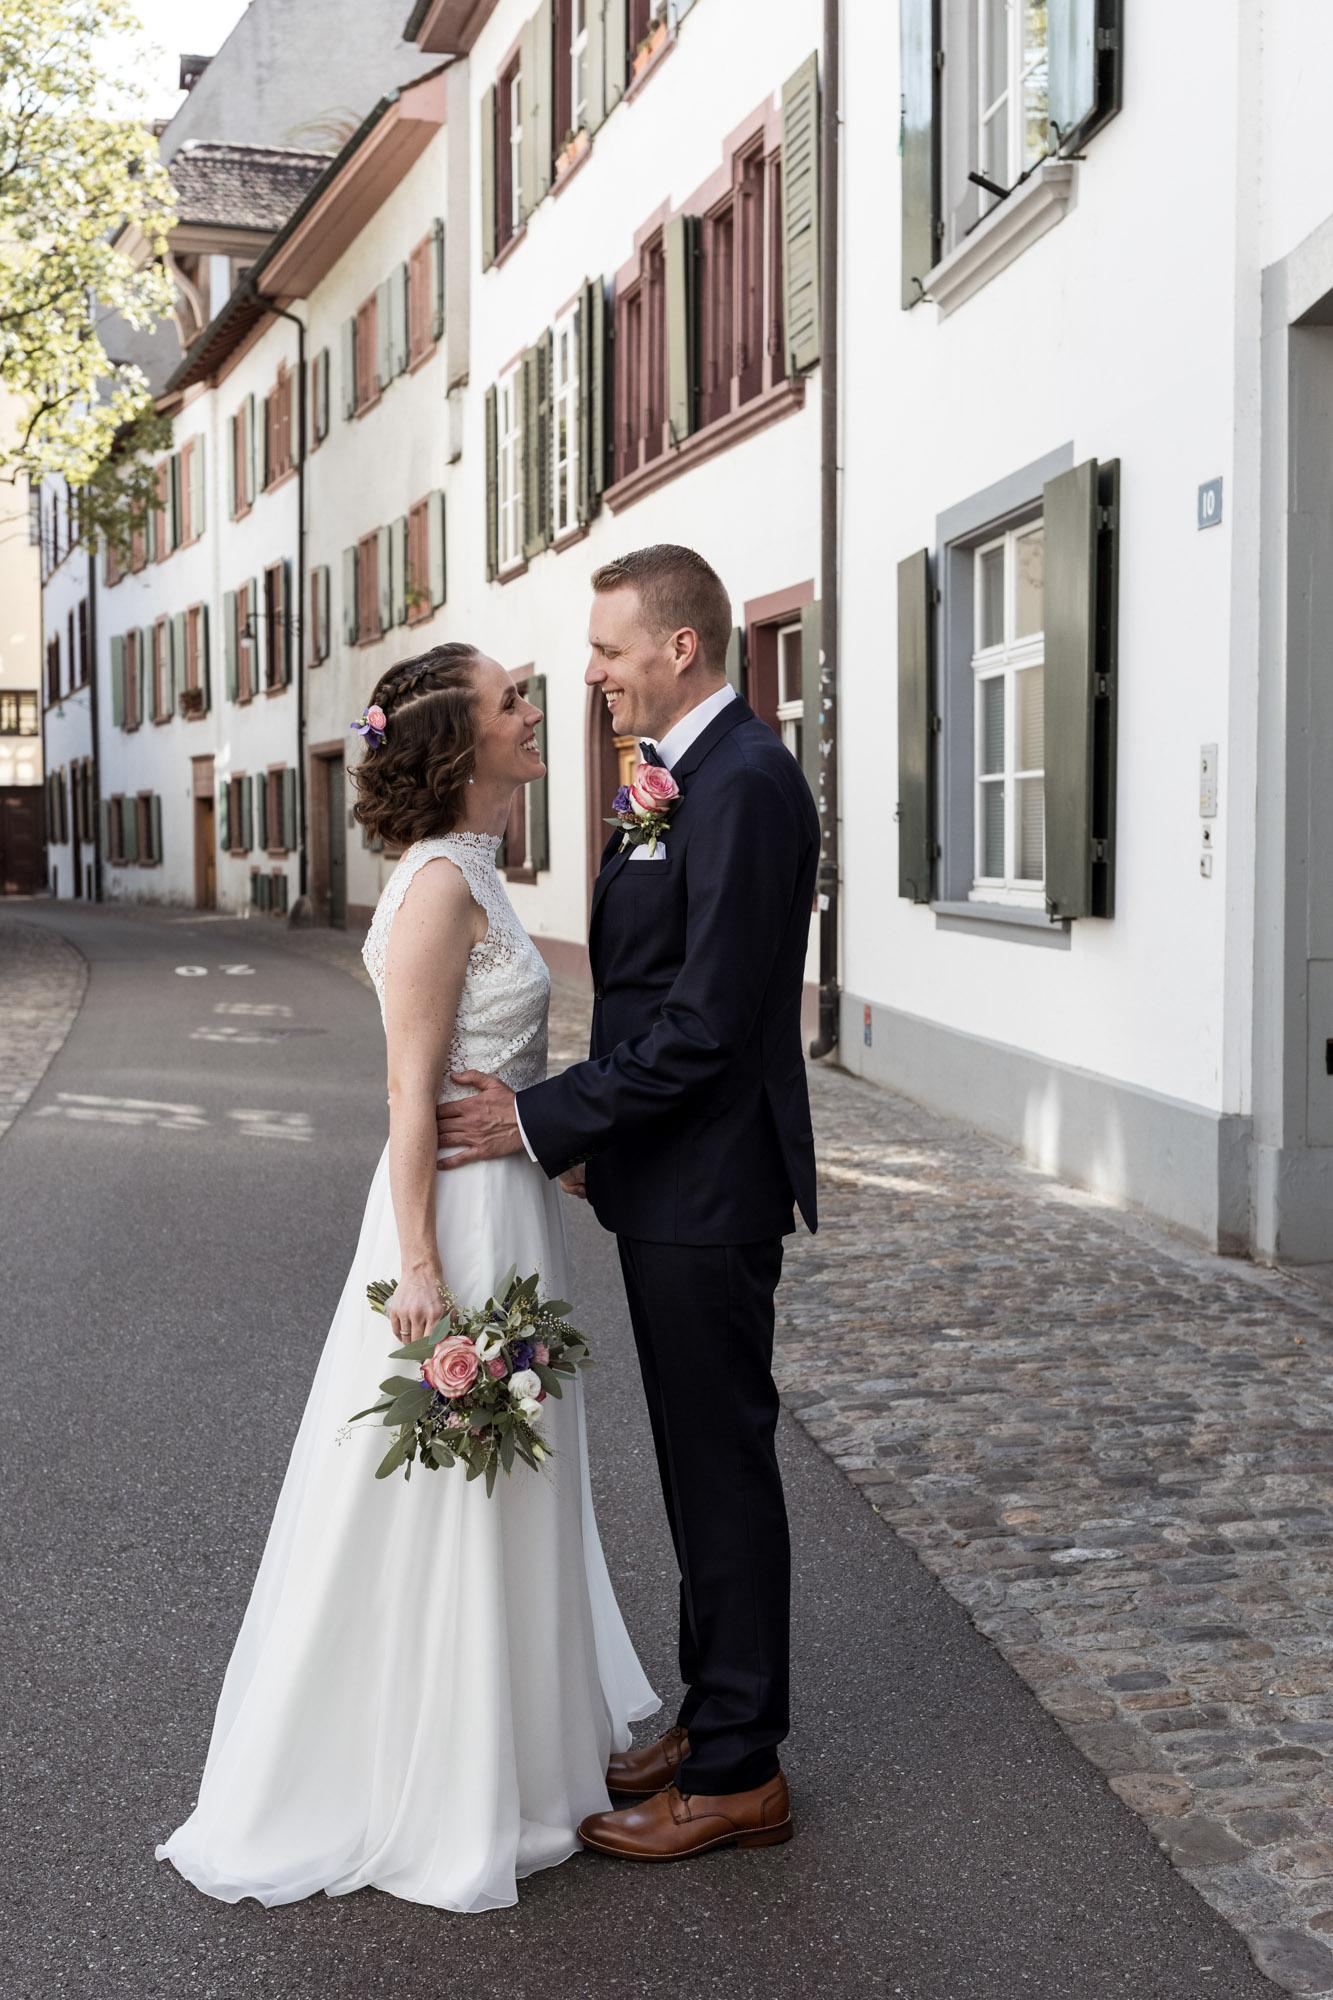 Brautpaar Fotoshooting in der Altstadt Basel - Hochzeitsfotografen